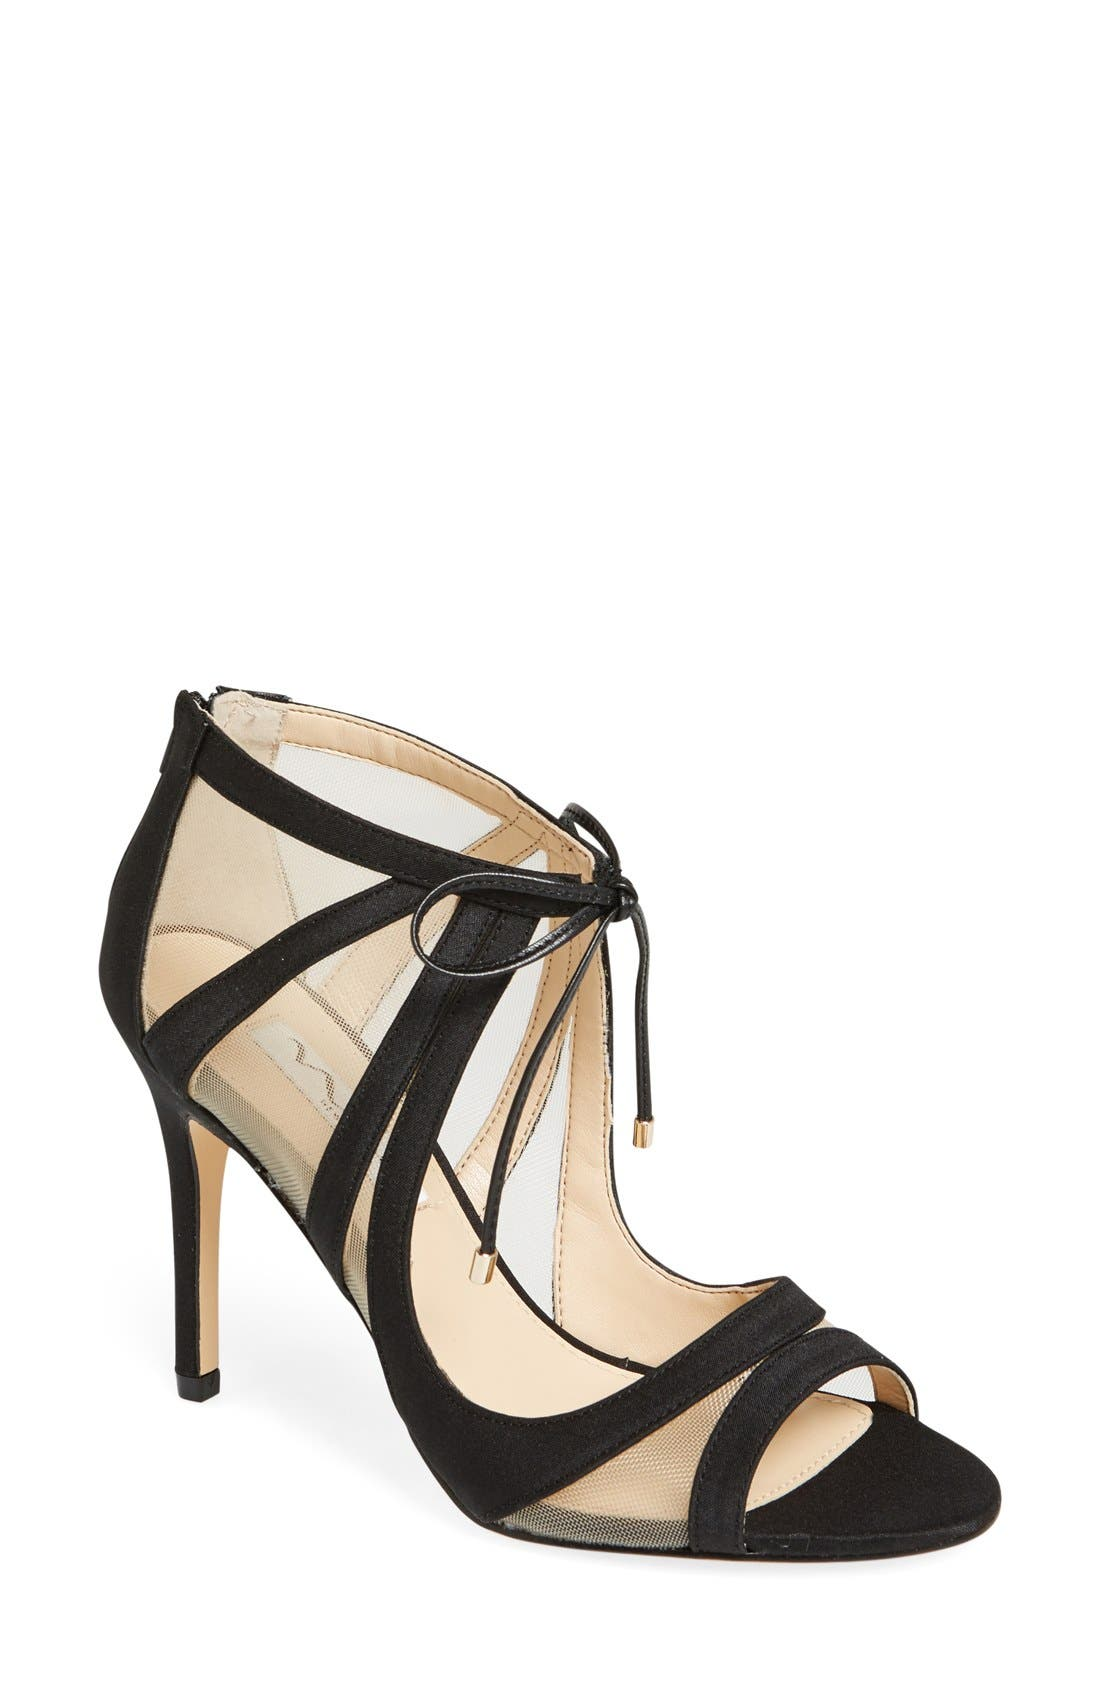 Cherie Illusion Sandal,                         Main,                         color, BLACK SATIN/ NUDE MESH